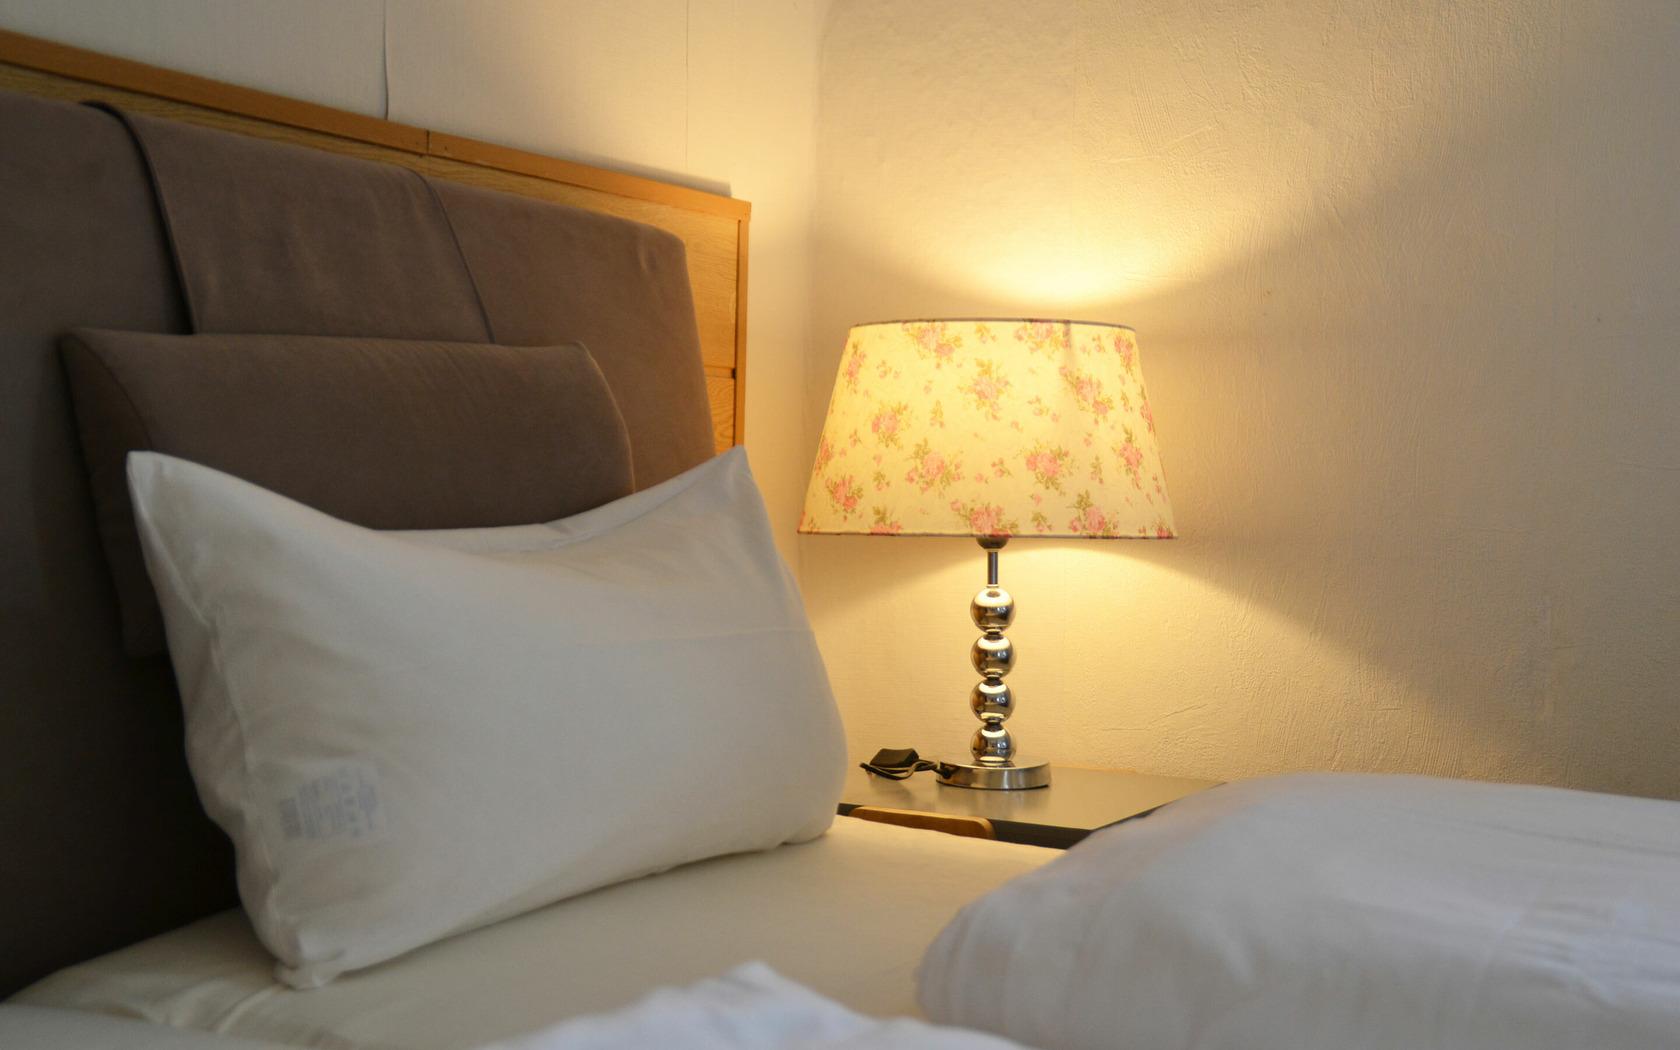 Doppelzimmer, Foto: MuT Guben e.V.